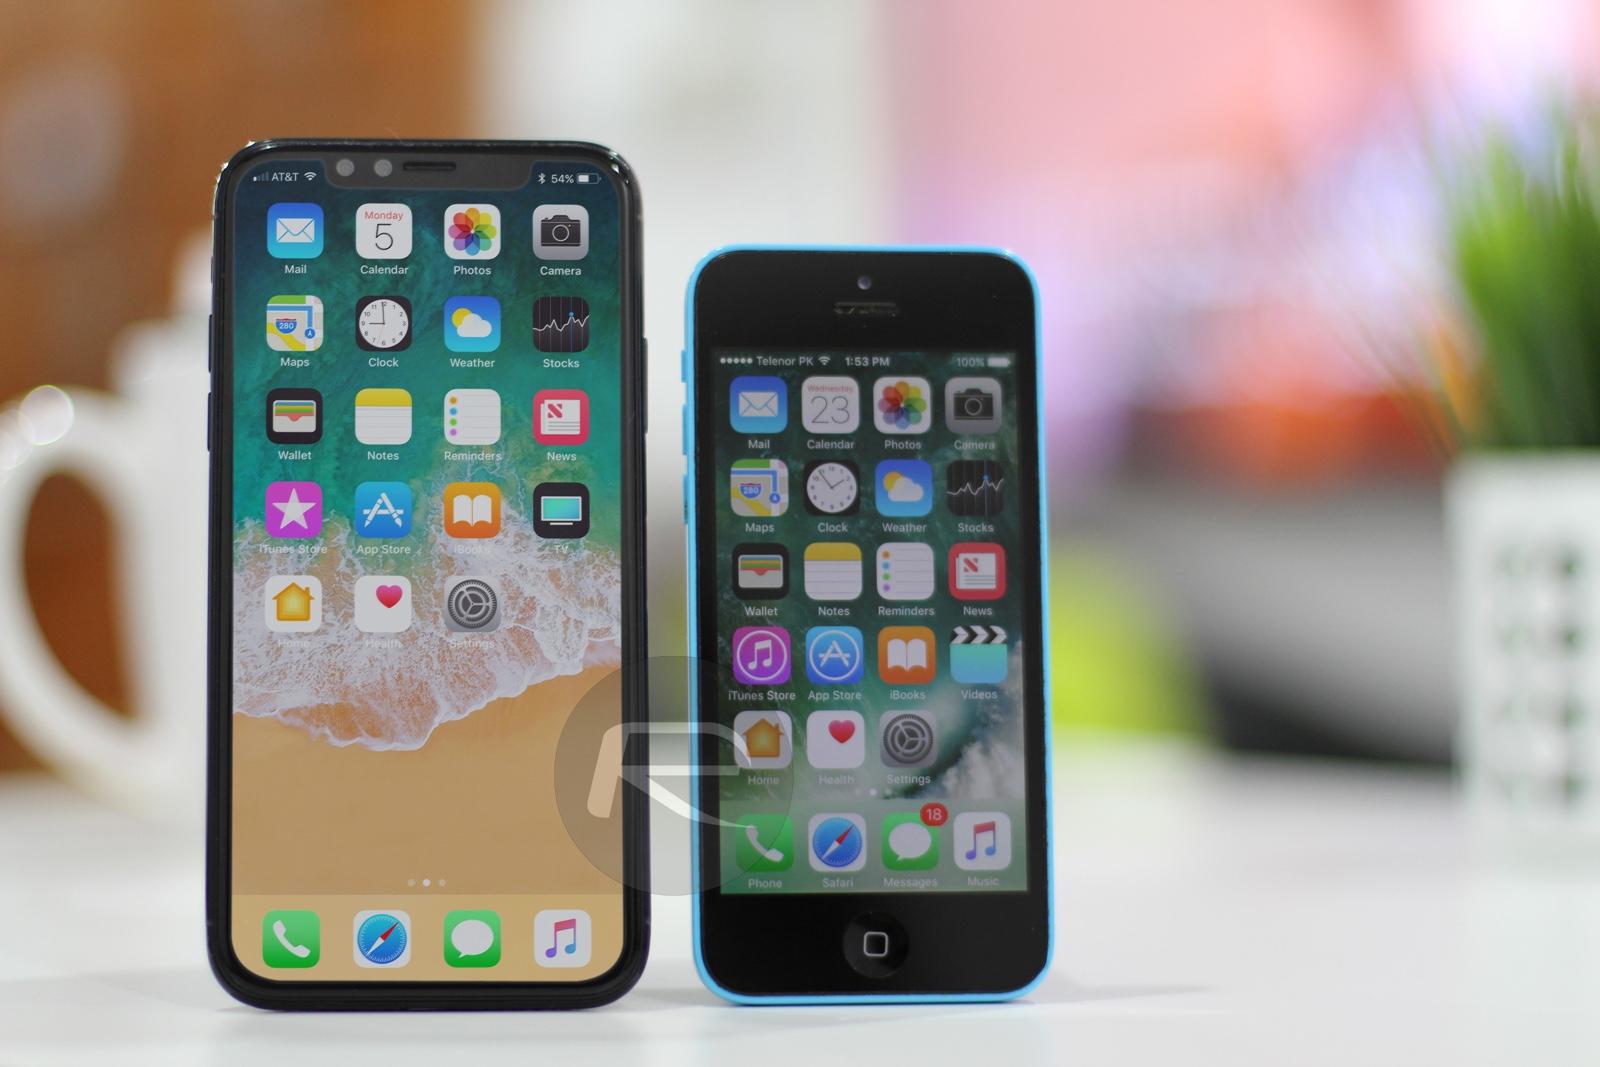 iPhone X / Edition Vs iPhone 7 Vs 7 Plus Vs 6s Vs 2G, More